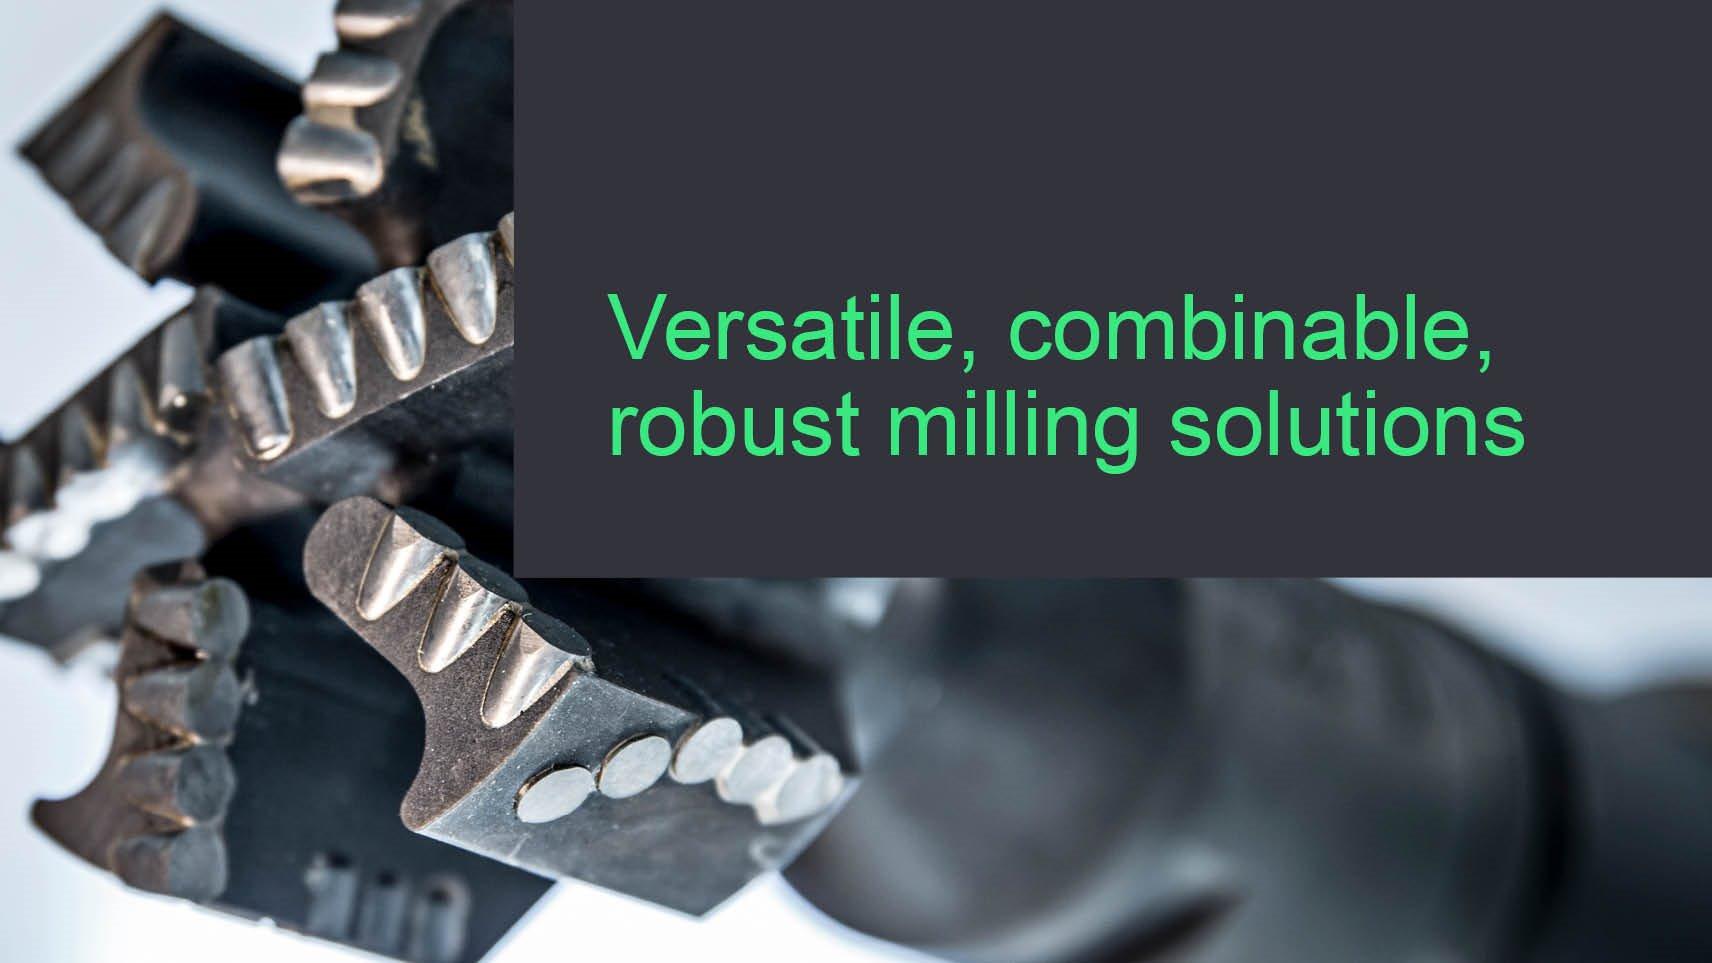 Hero Versatile, Combinable, Robust Milling Solutions